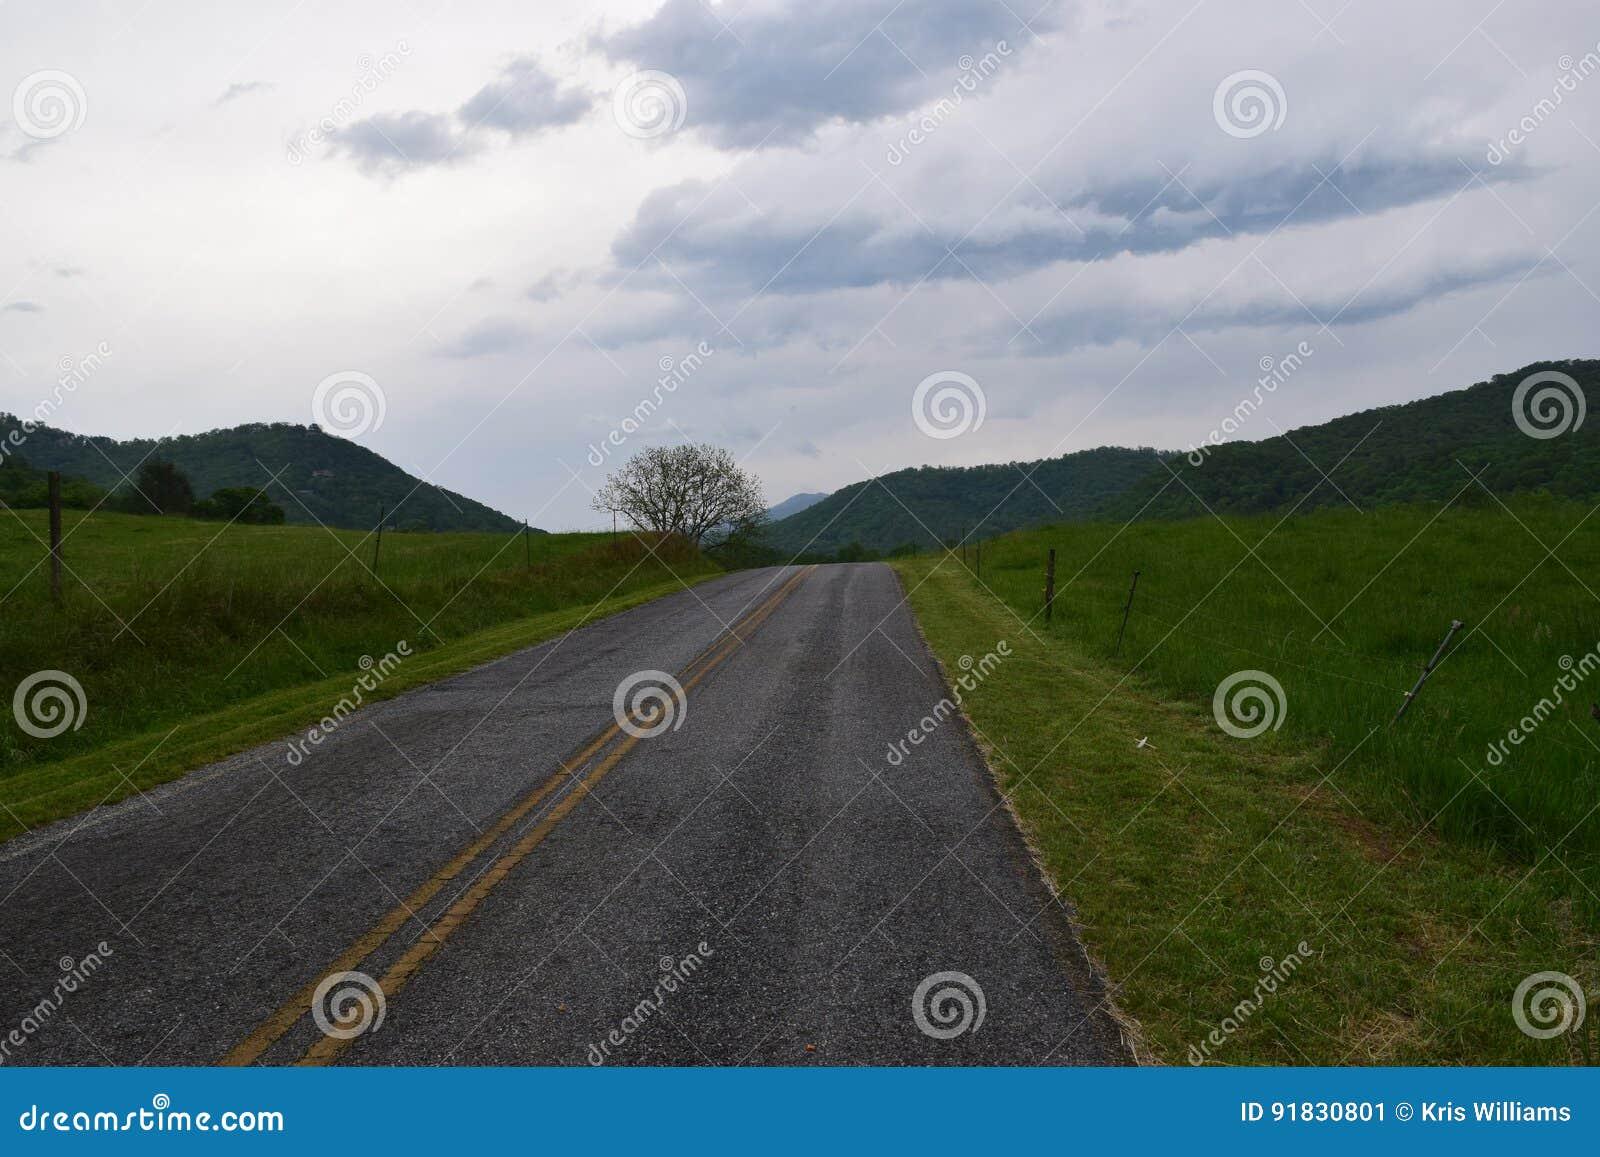 Western NC mountain rural road